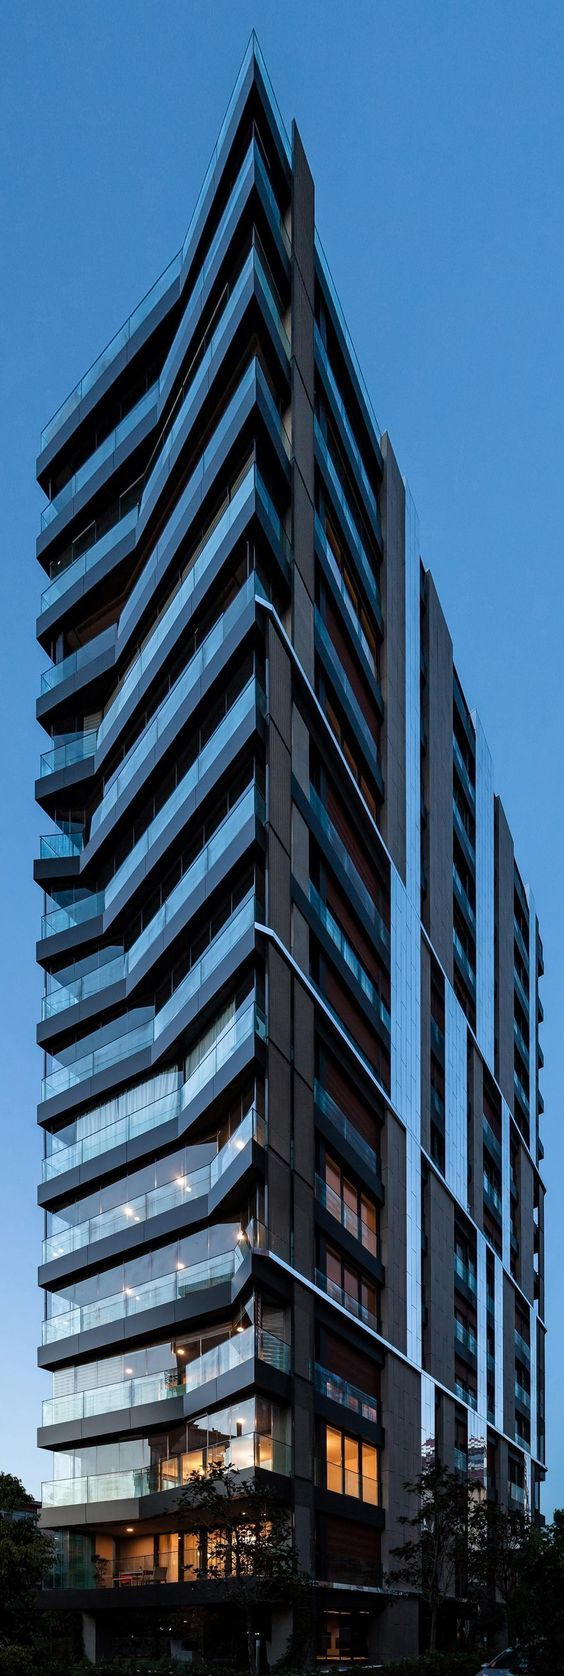 Arkvista Residence By Arkizon Architects Architecture